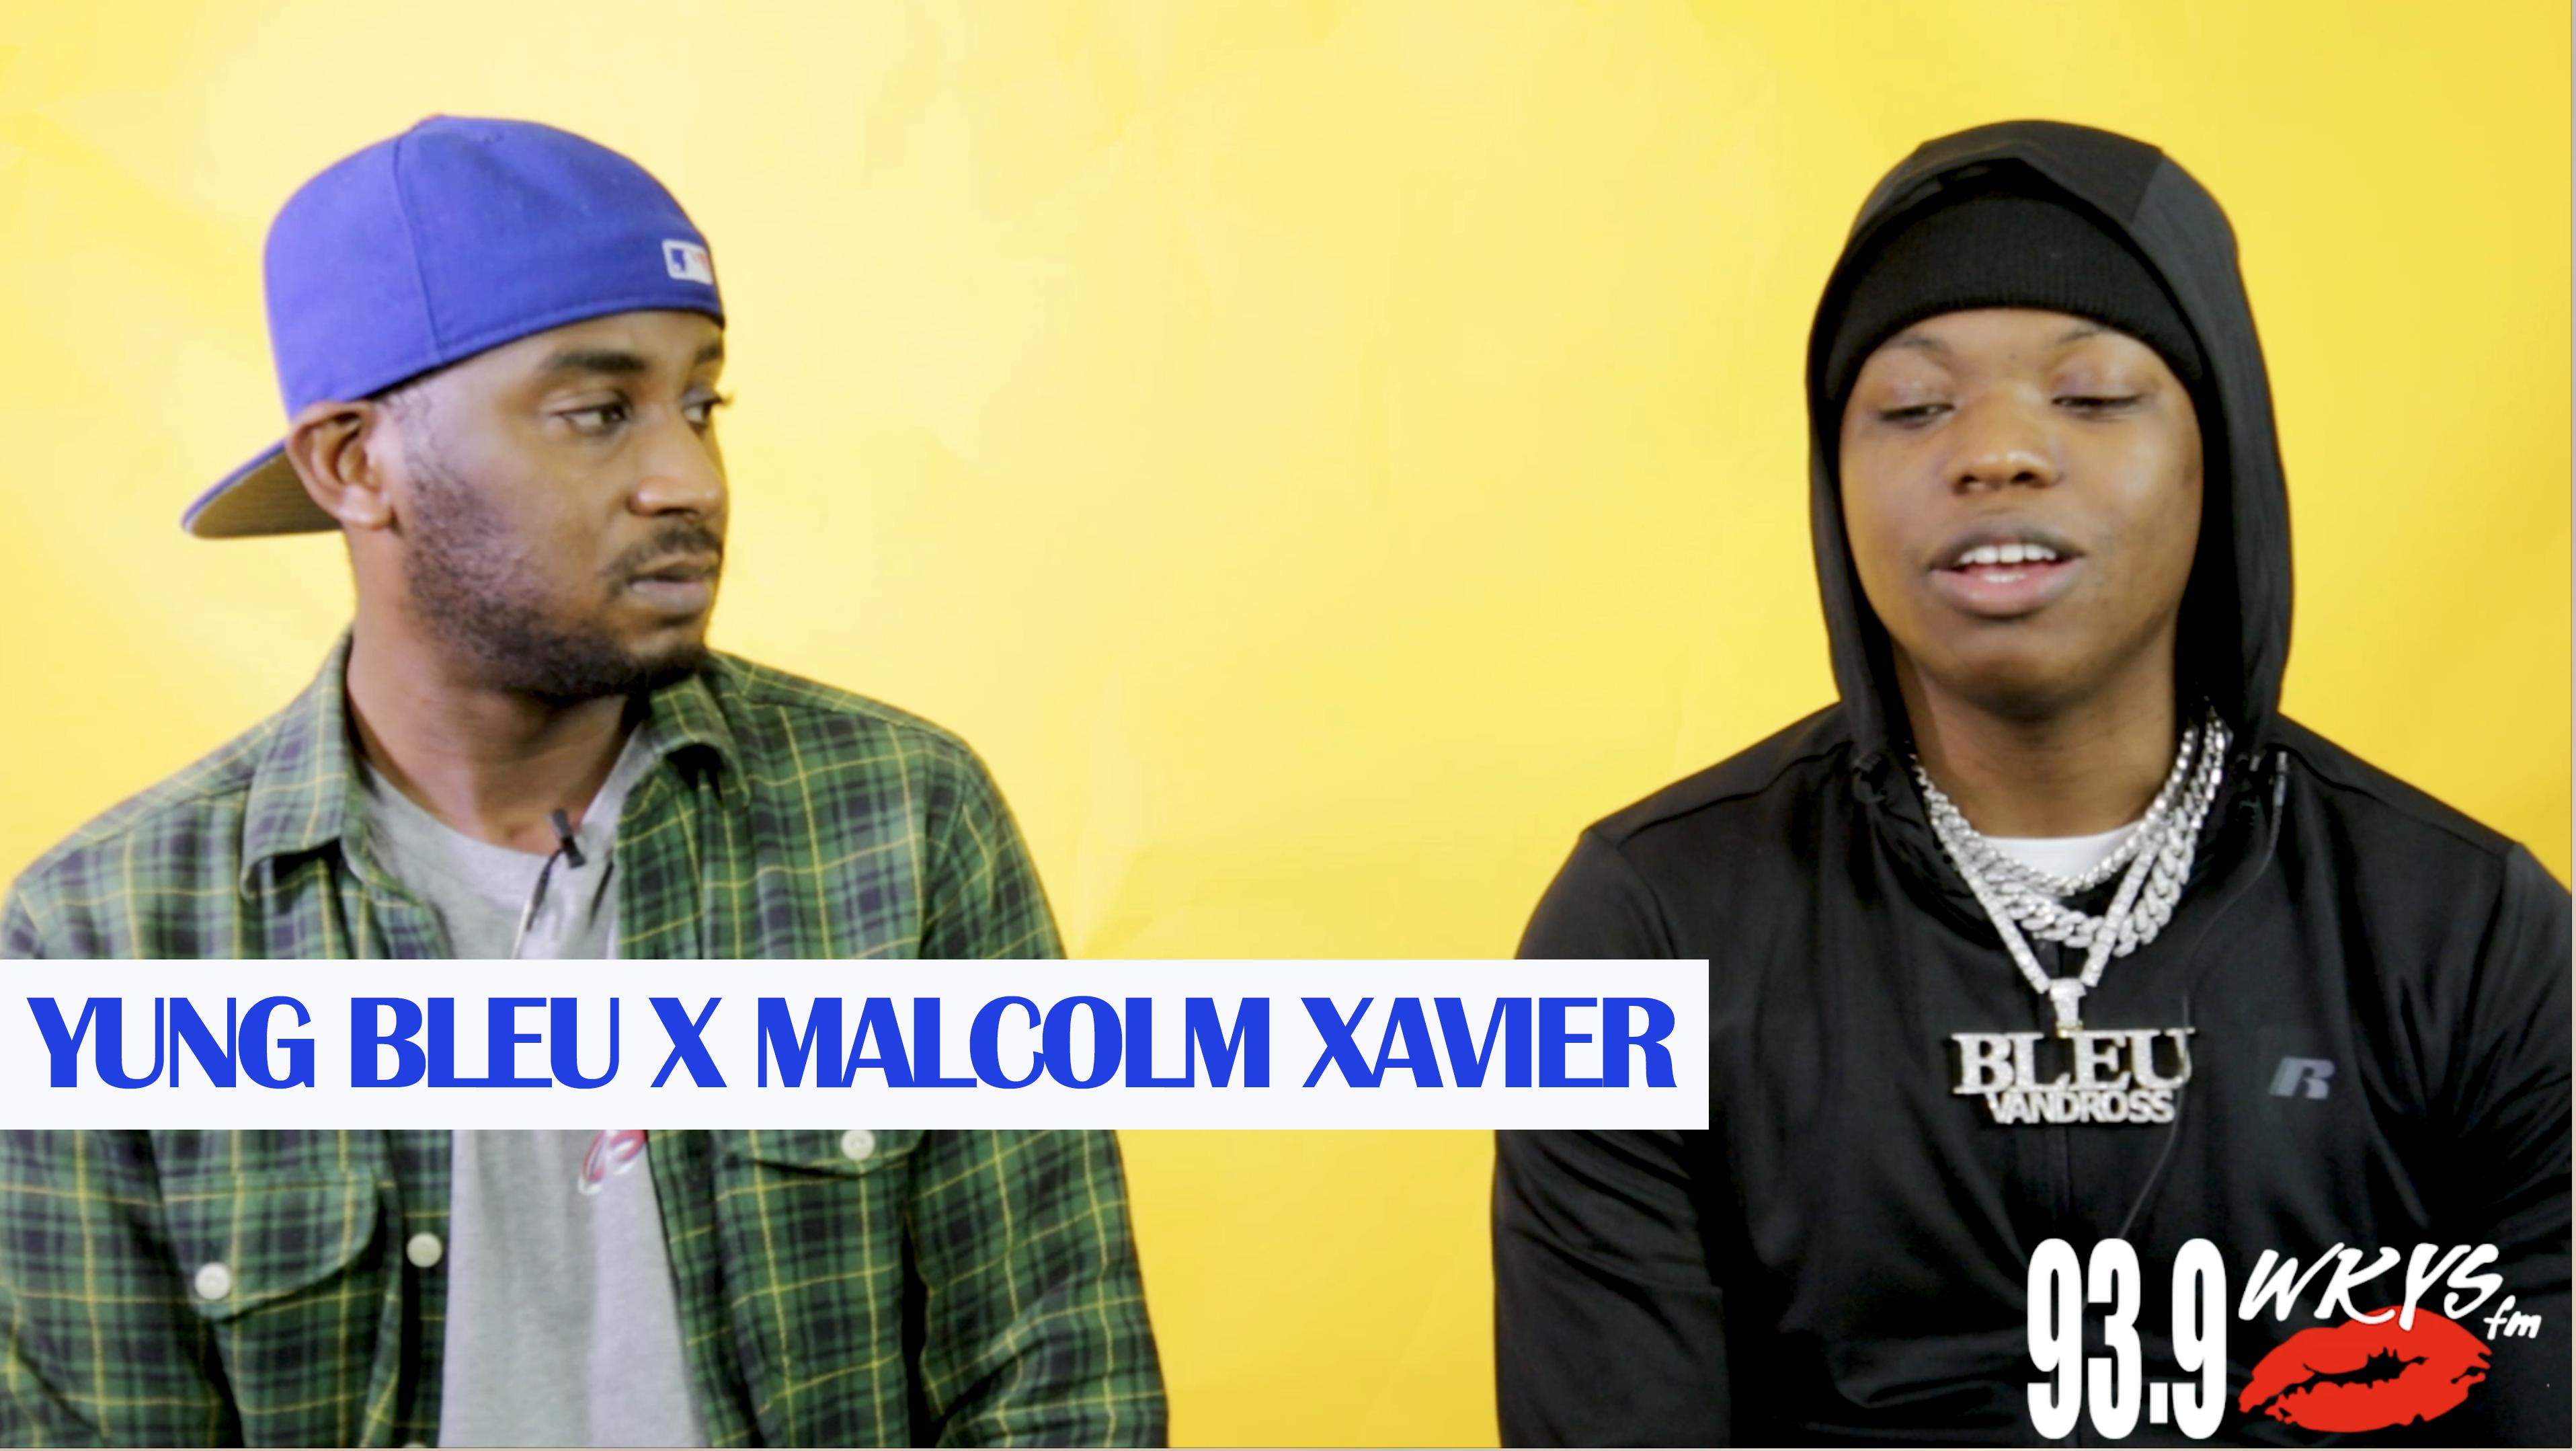 Malcolm Xavier Talks With Yung Bleu